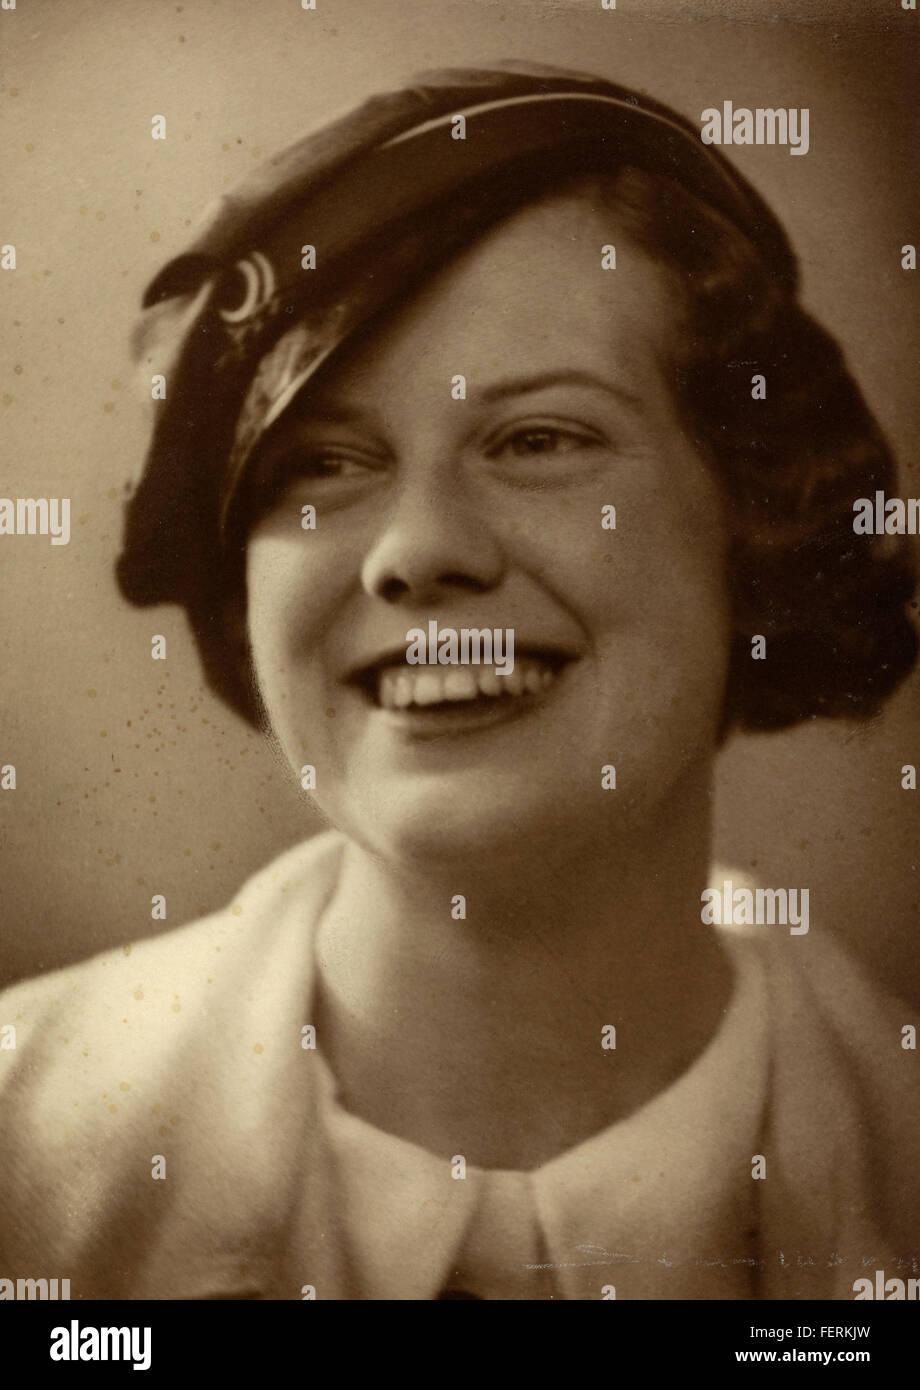 Portrett av Ebba Haslund som student / Portrait of Ebba Haslund as a student Portrett av Ebba Haslund som student - Stock Image